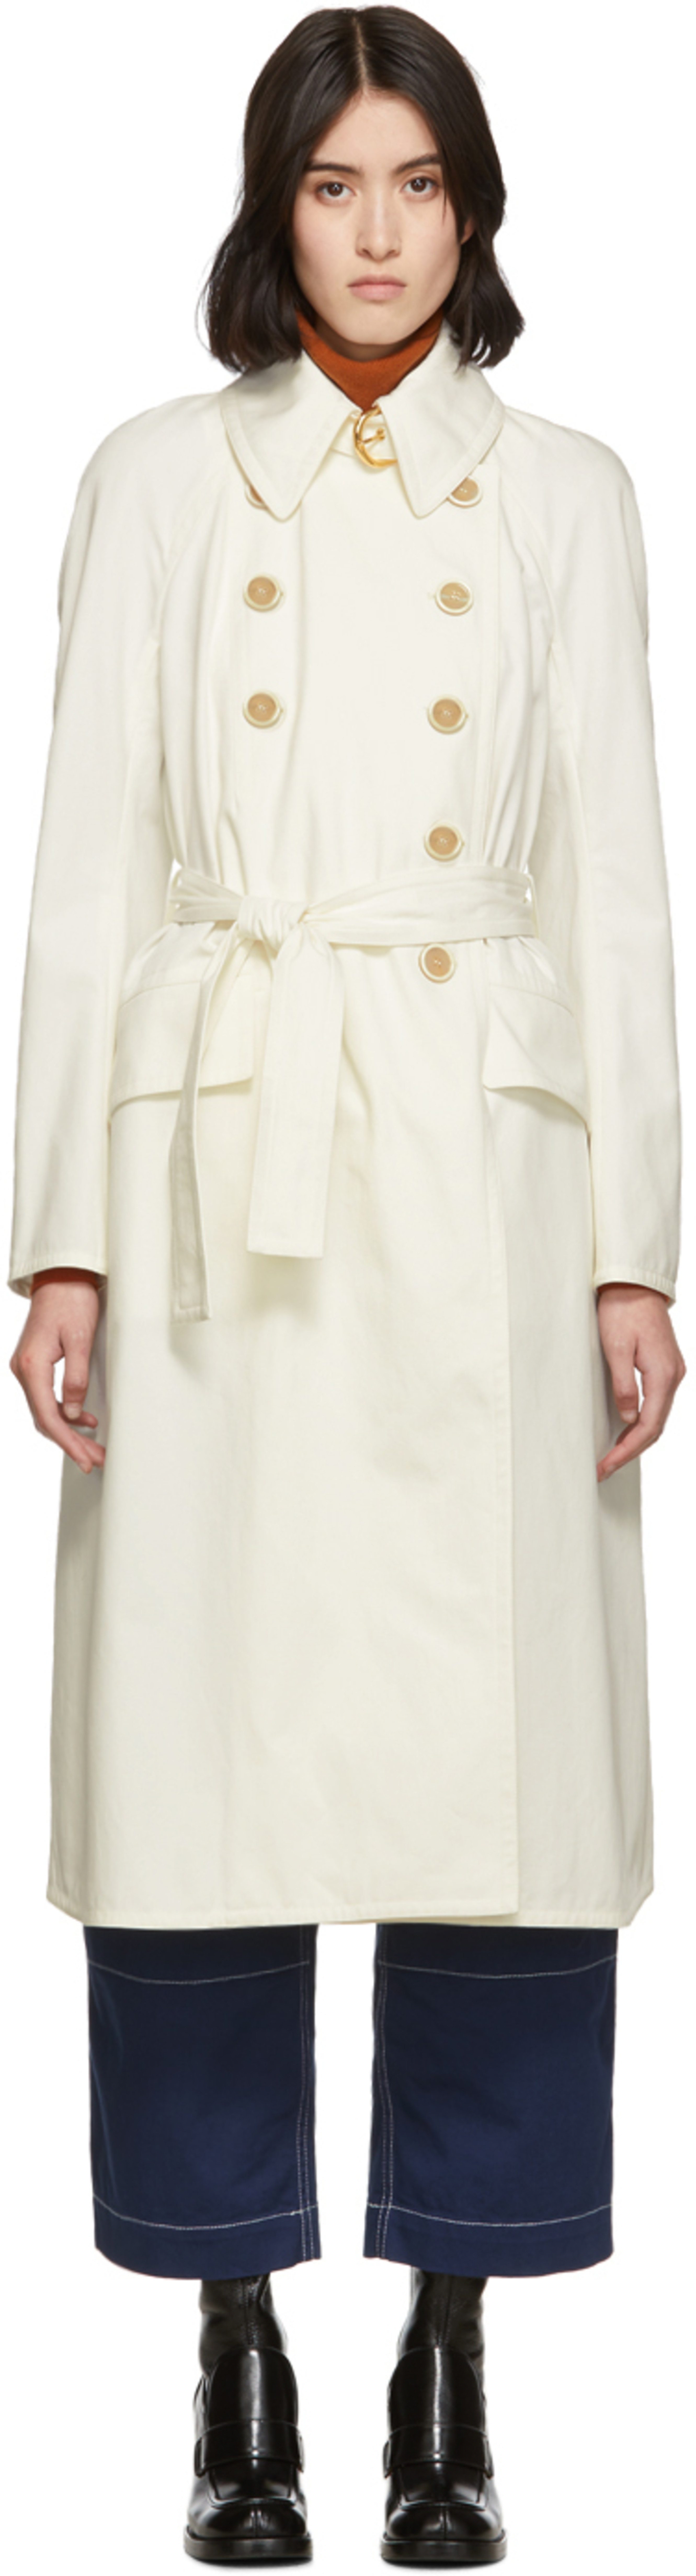 213df048d2 White Cotton Panama Trench Coat